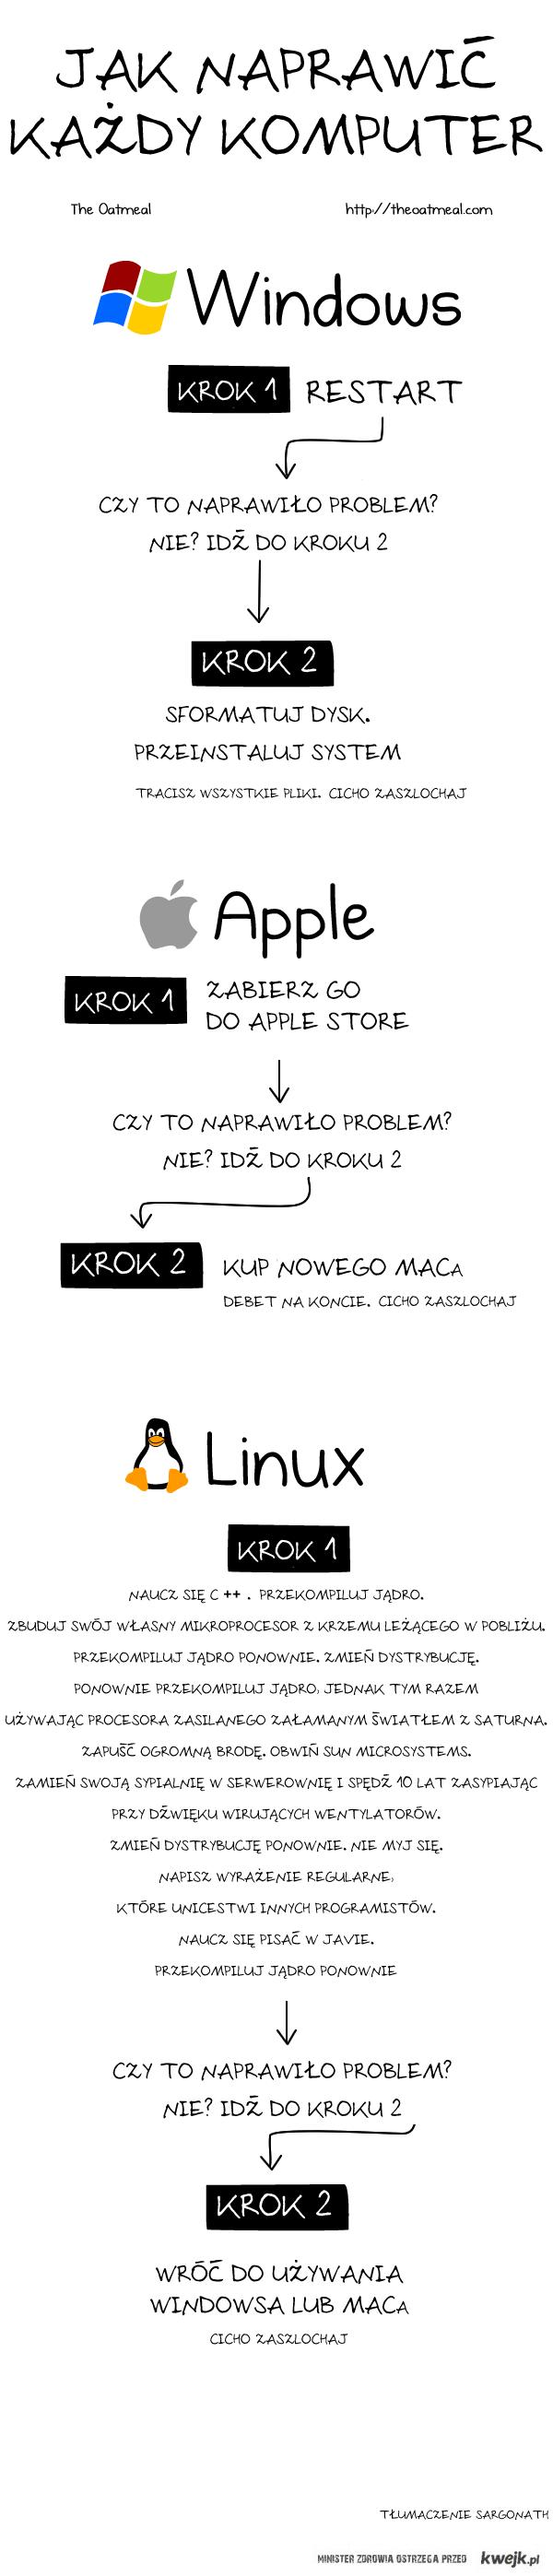 Jak naprawić komputer?